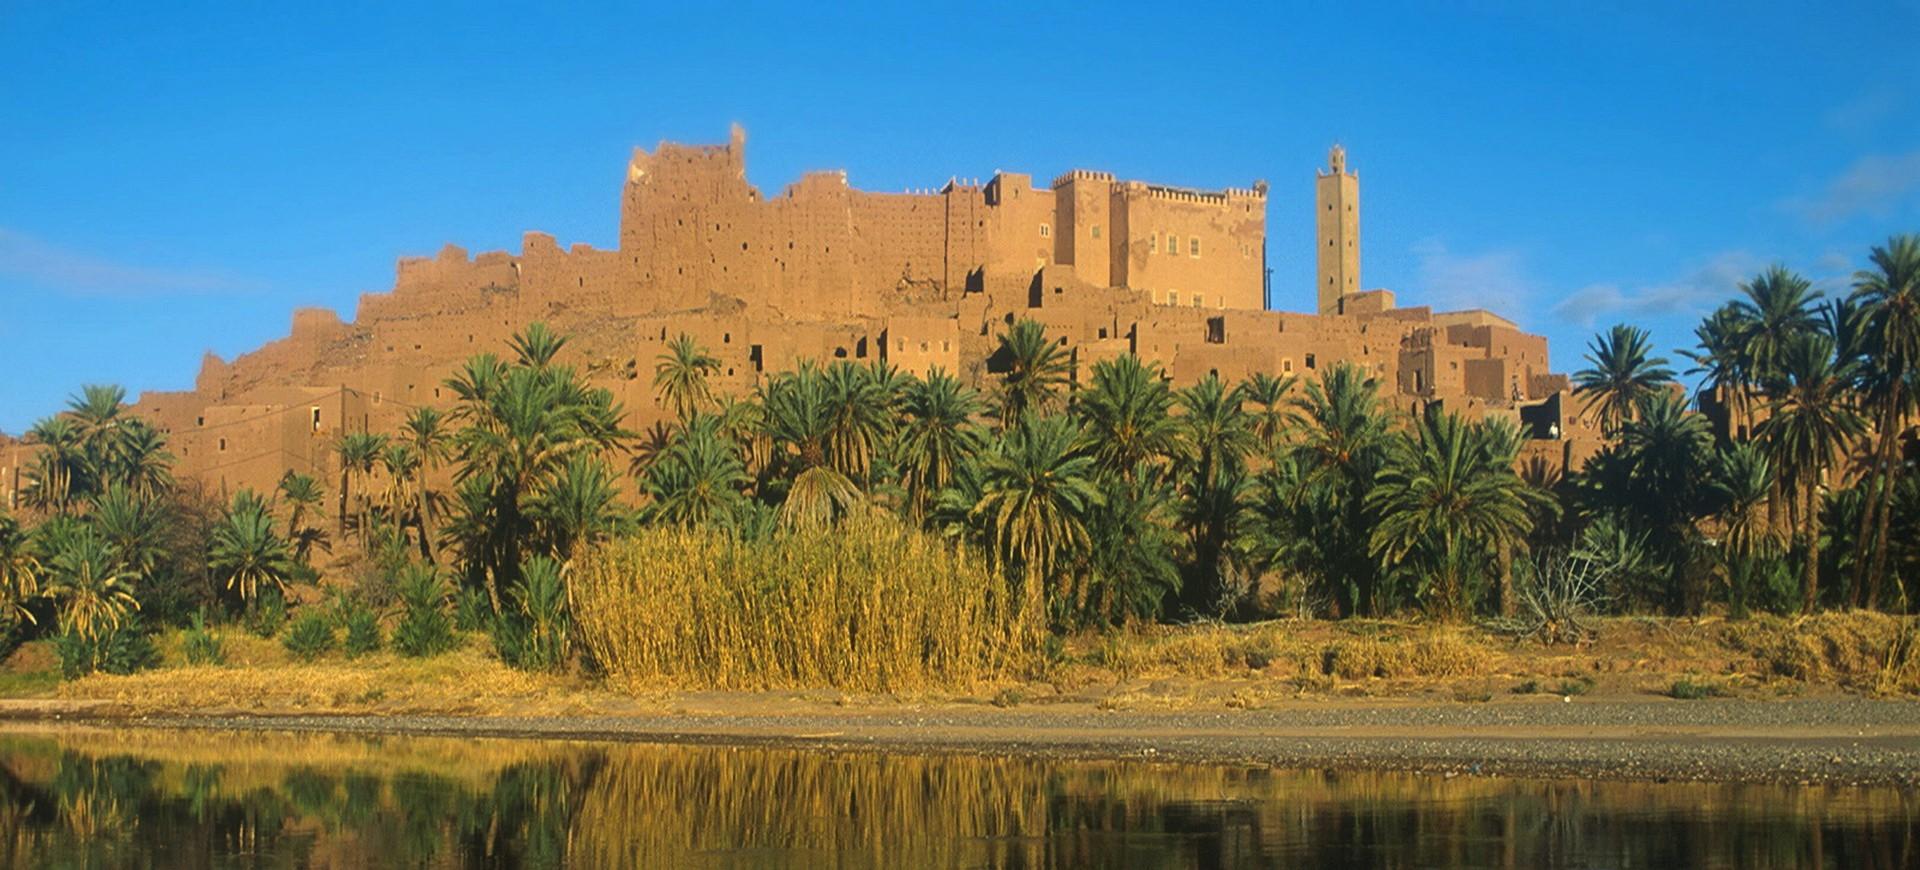 Ait Ben Haddou à Ouarzazate